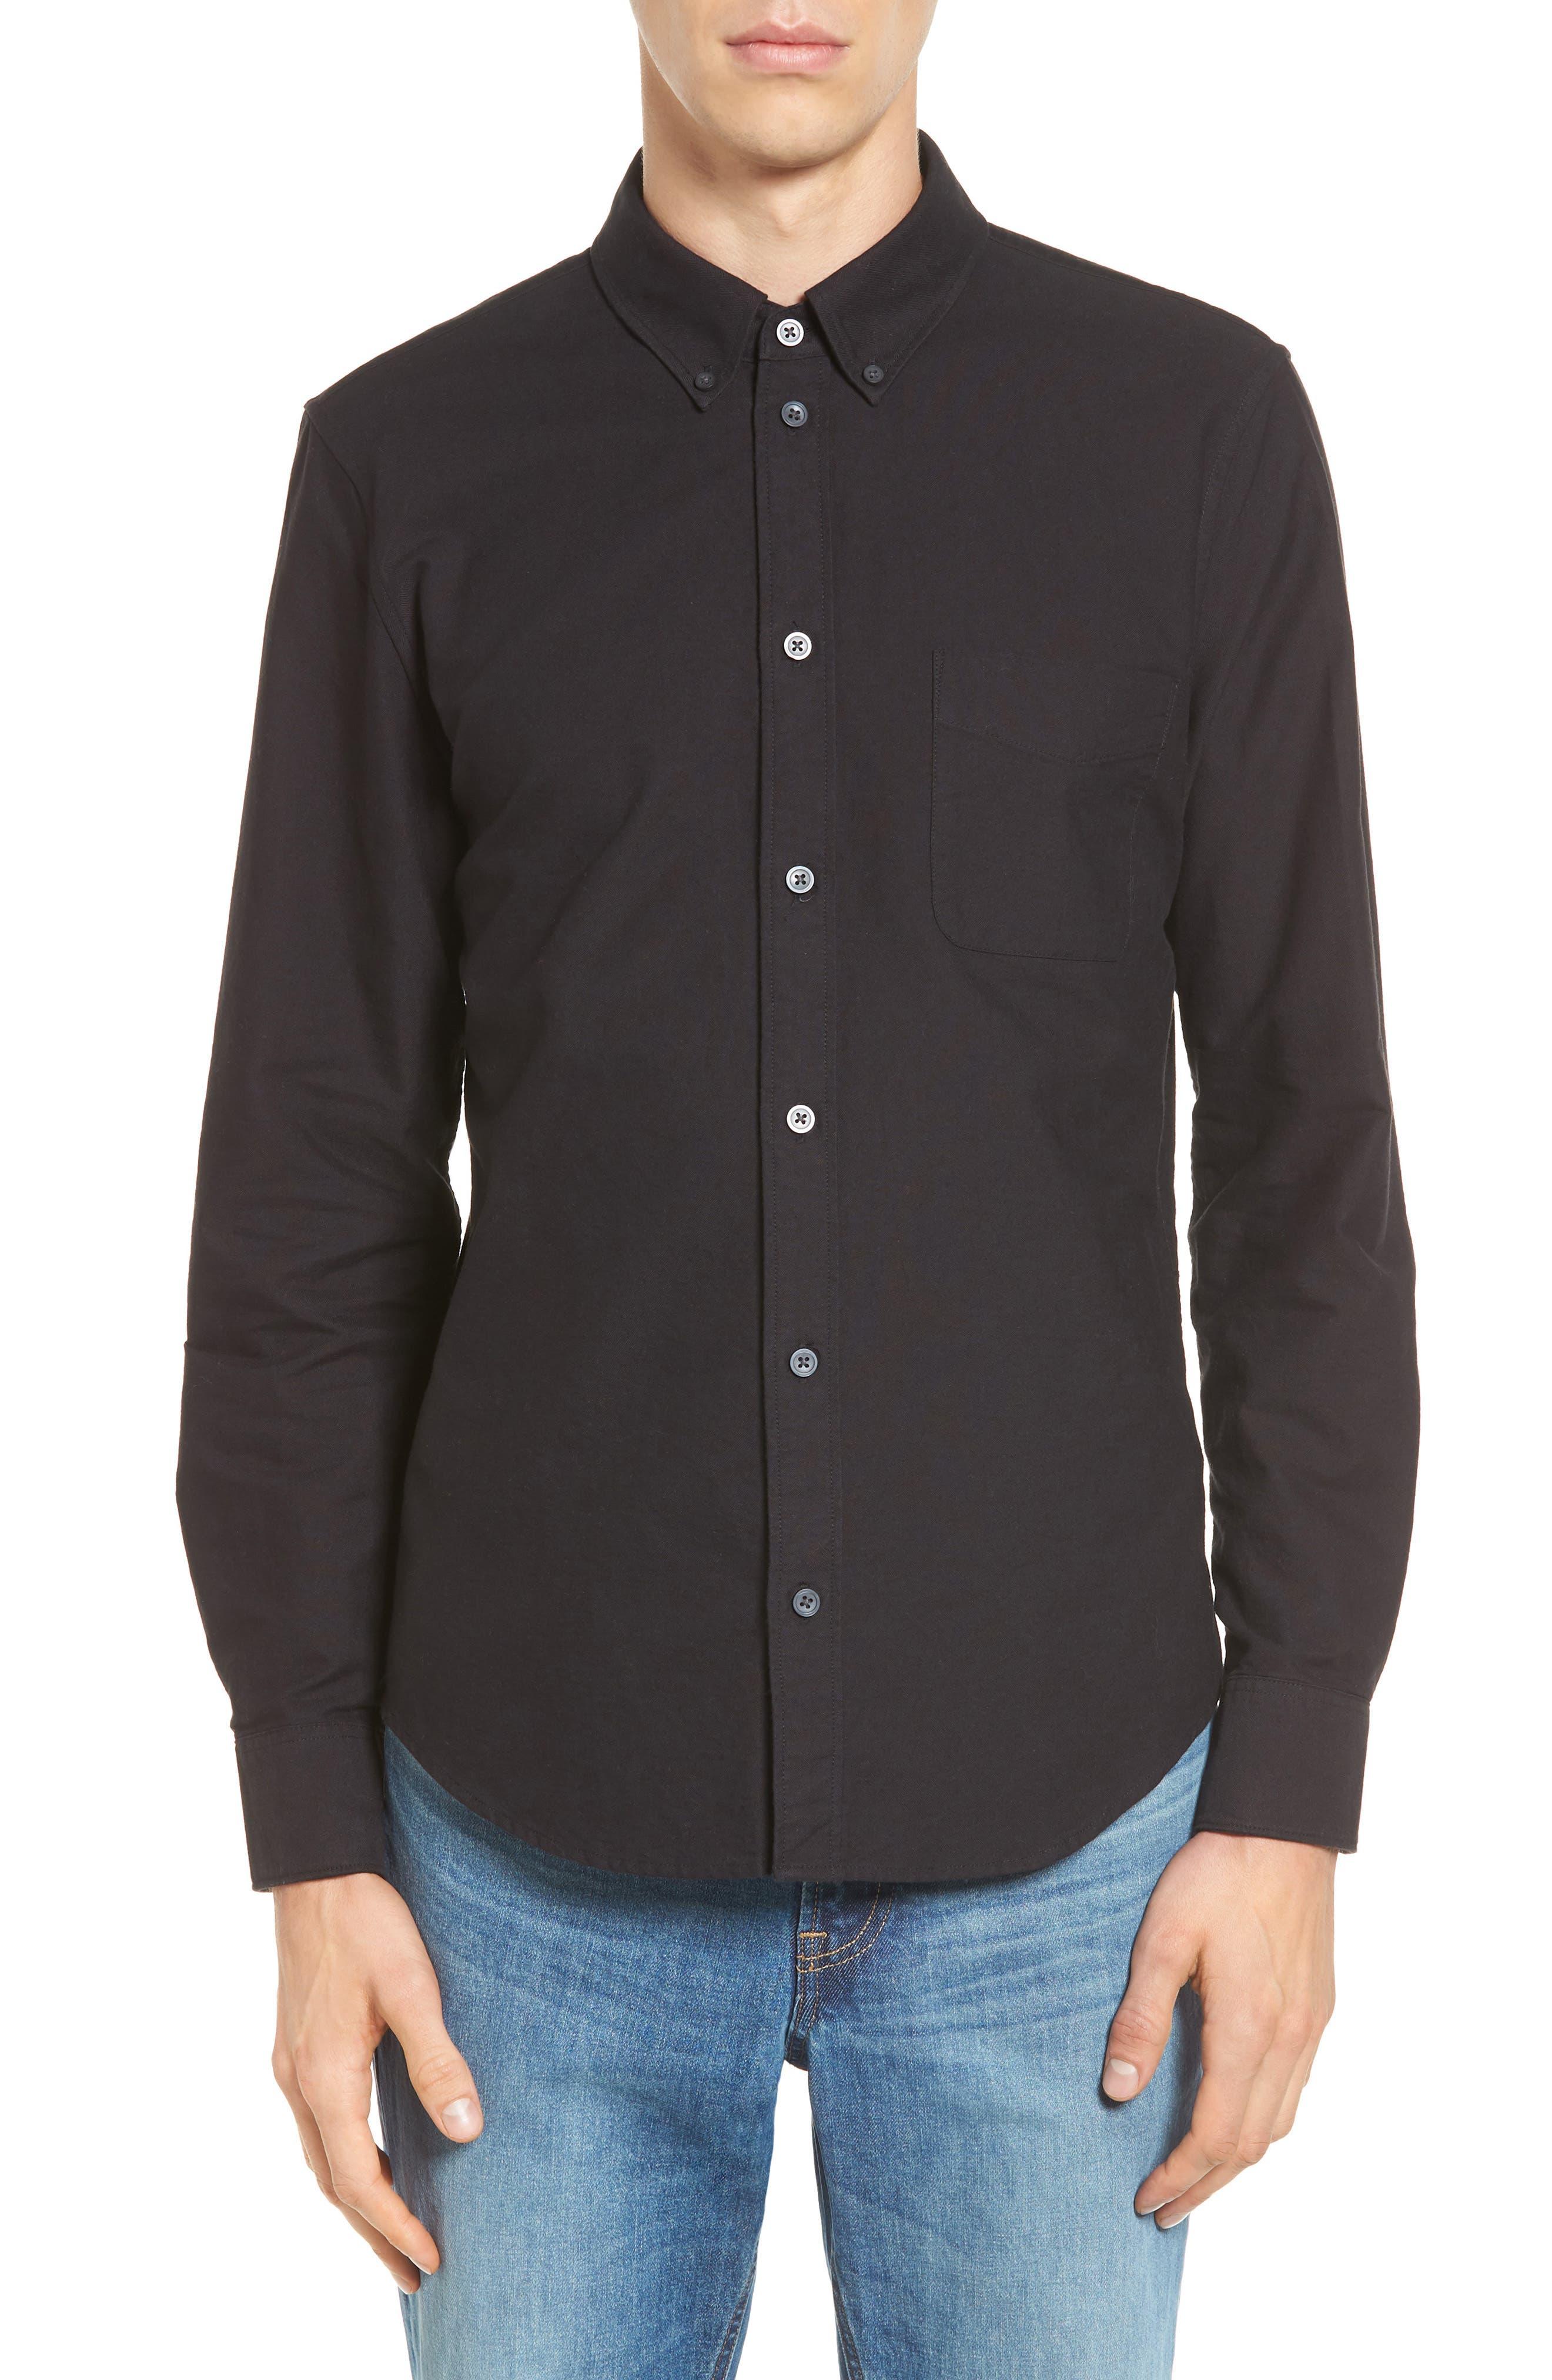 Main Image - Everlane The Japanese Slim Fit Oxford Shirt